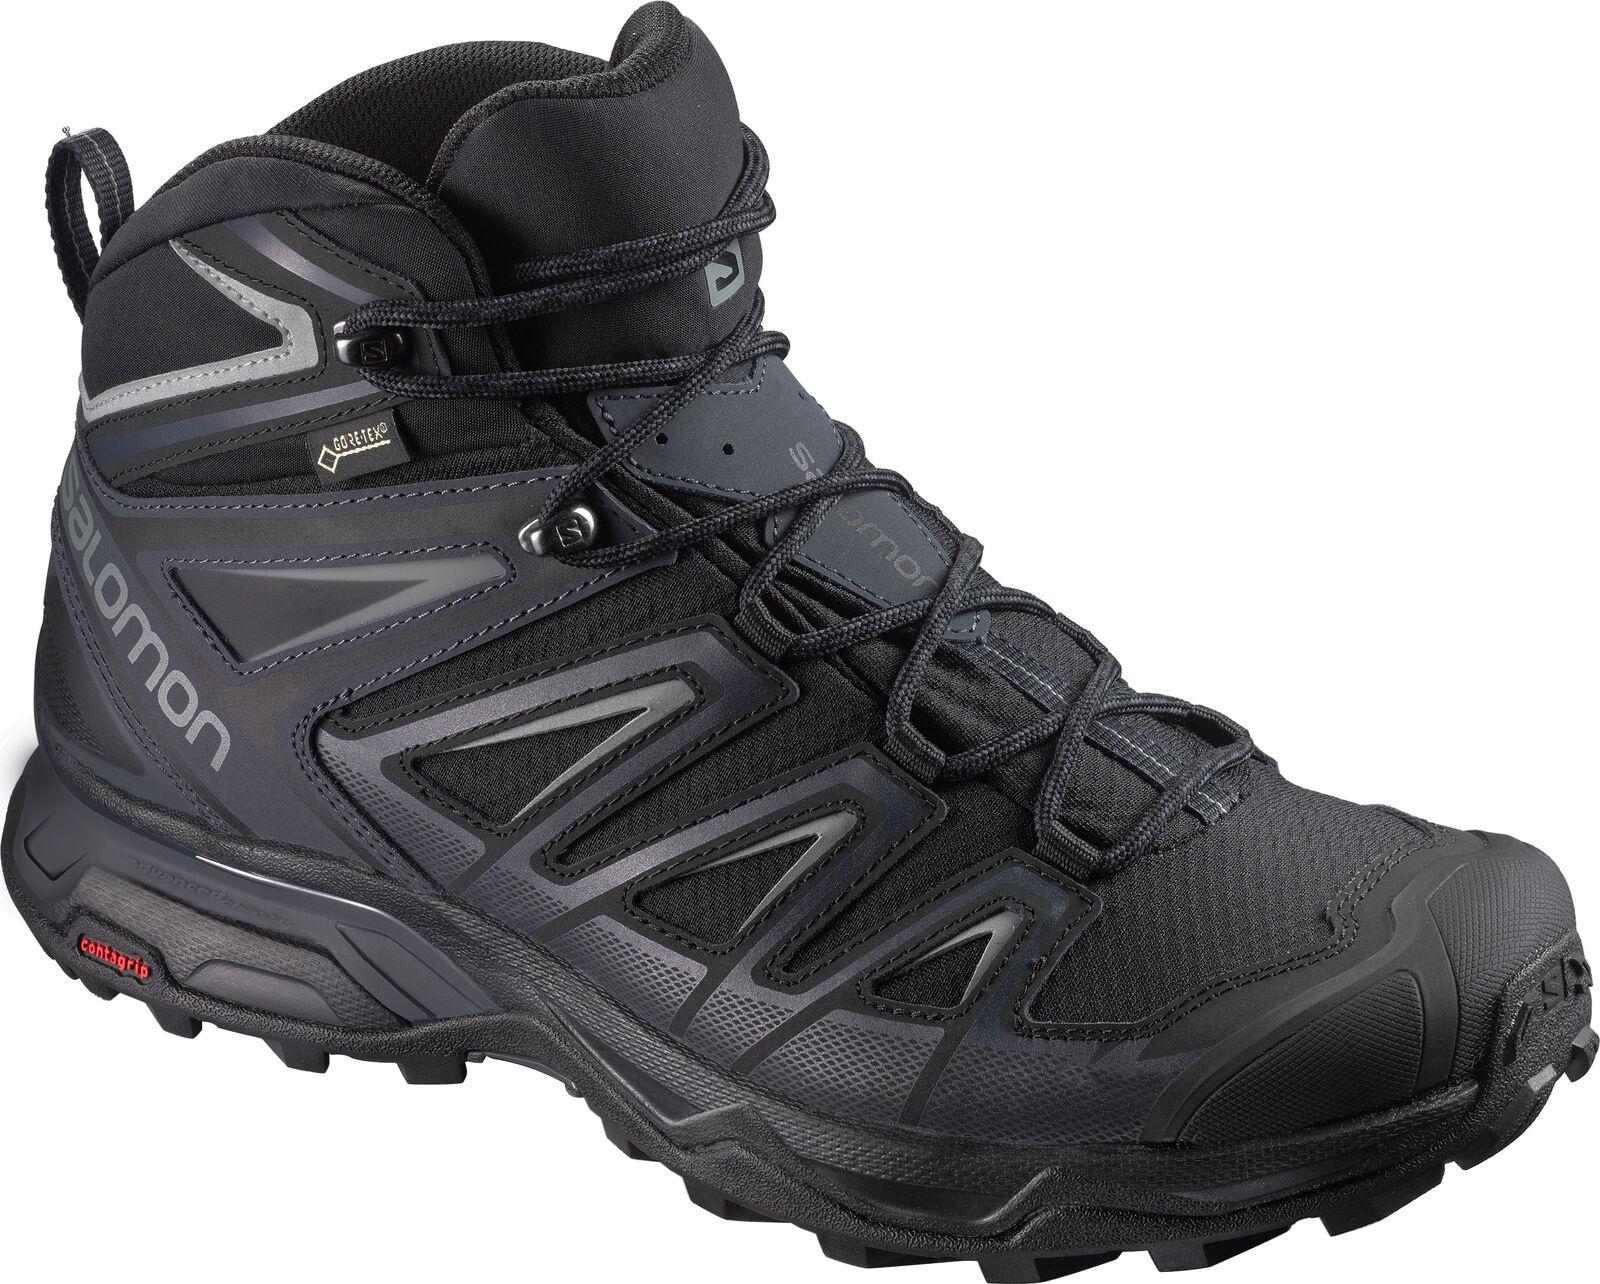 Salomon X ultra 3 Wide MID GTX ® (401293) - caballeros trekking zapato